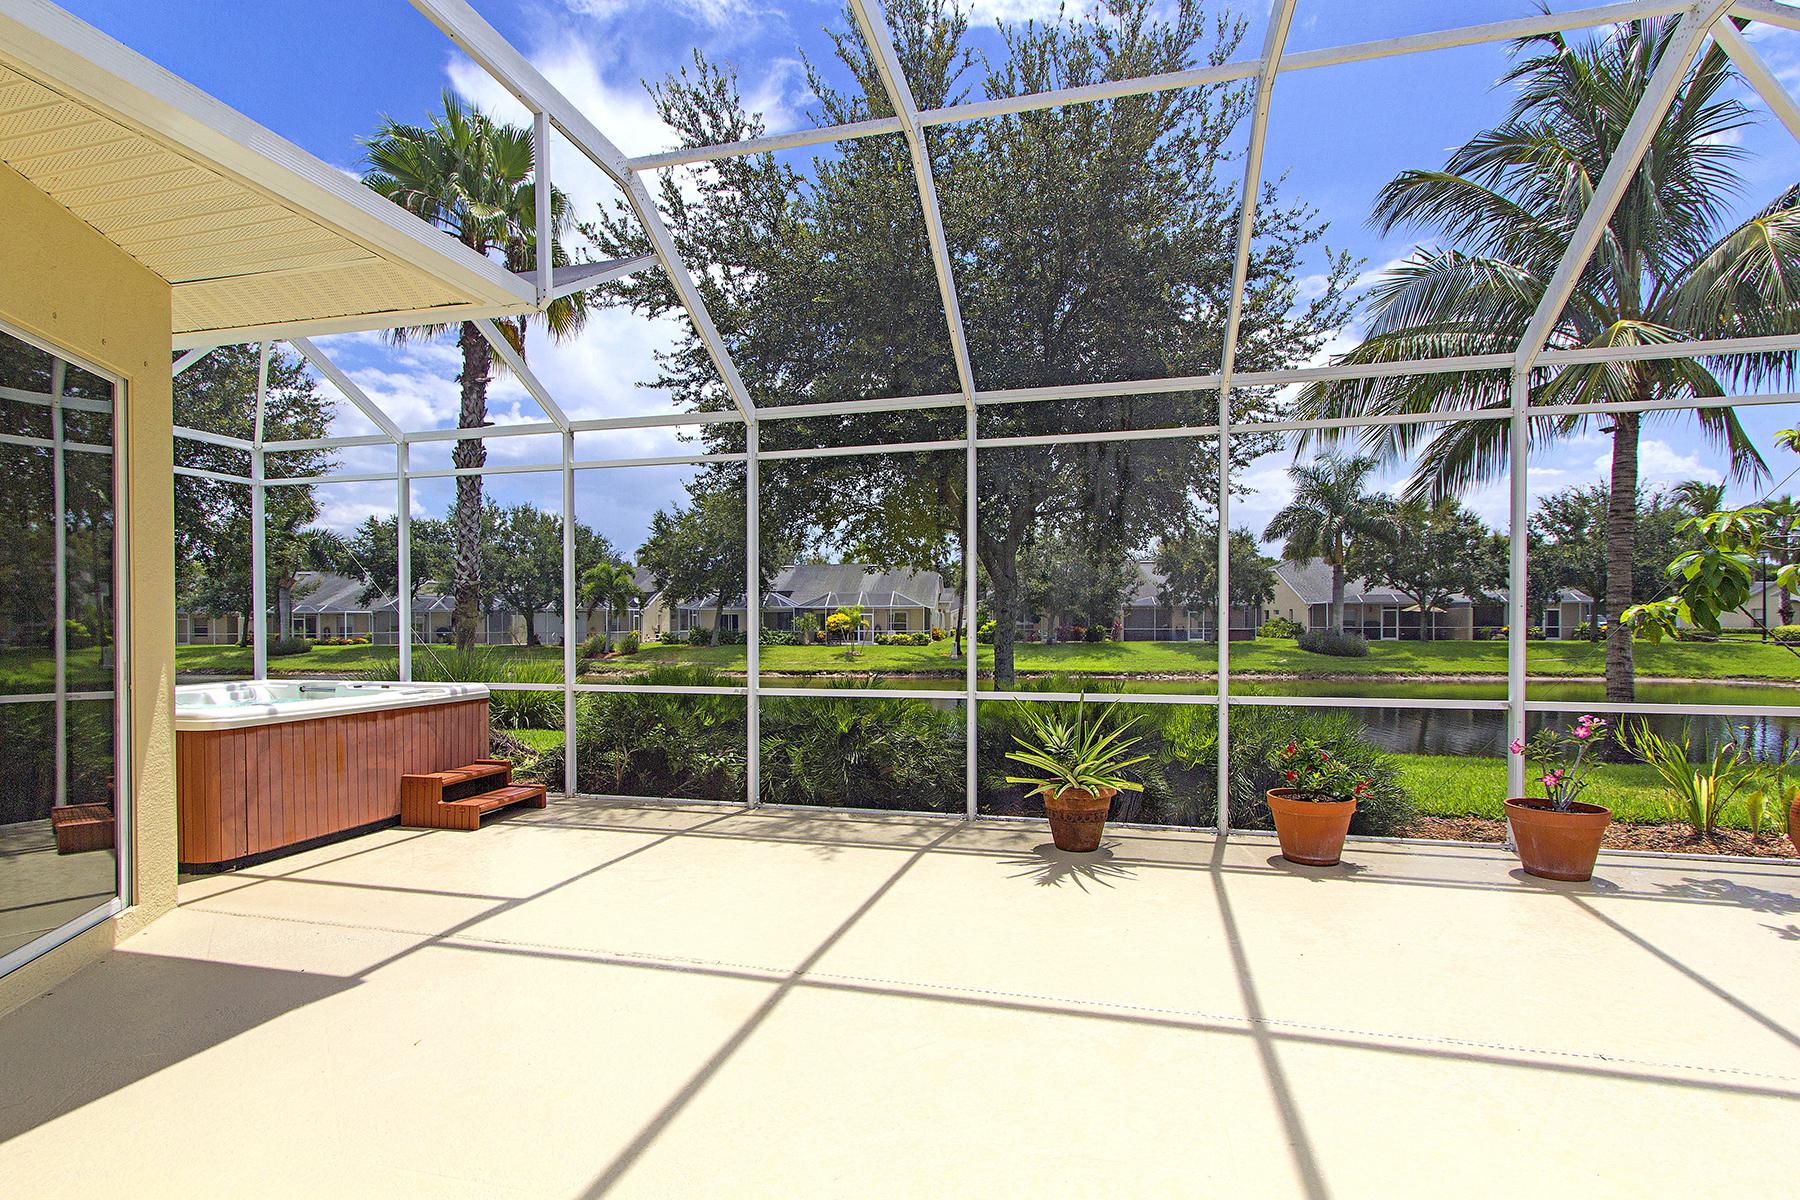 Single Family Home for Sale at 8098 Tauren Ct , Naples, FL 34119 8098 Tauren Ct Naples, Florida, 34119 United States